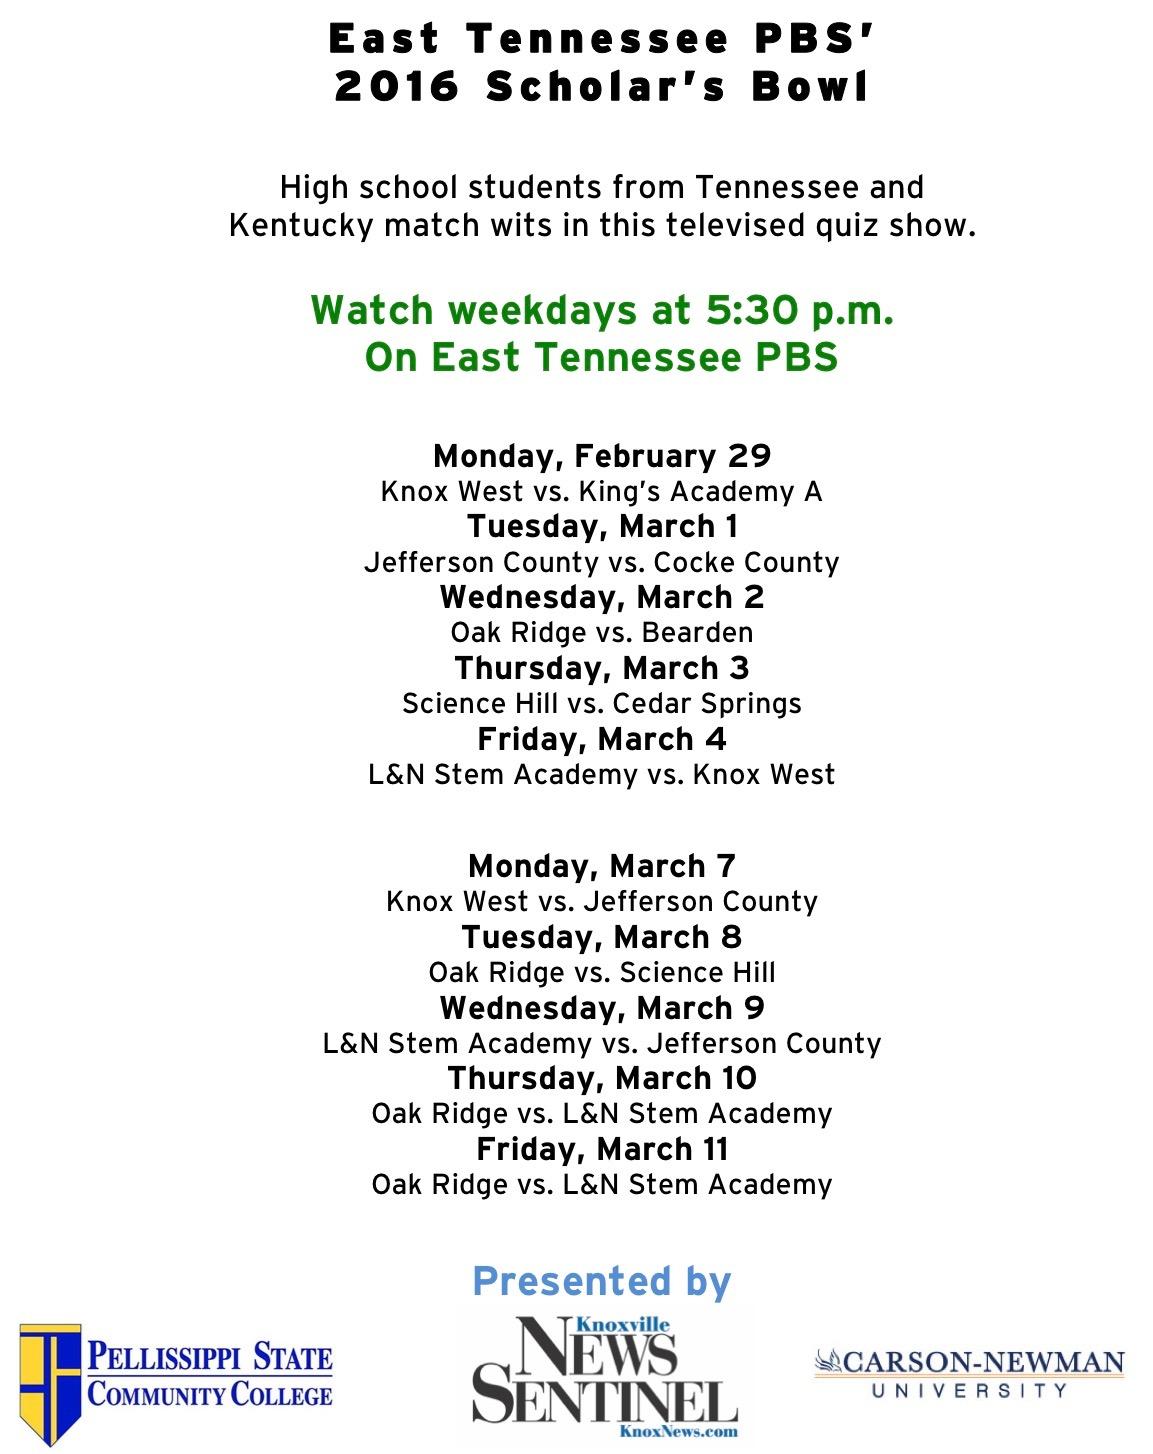 2016 Scholars Bowl Schedule E.jpg